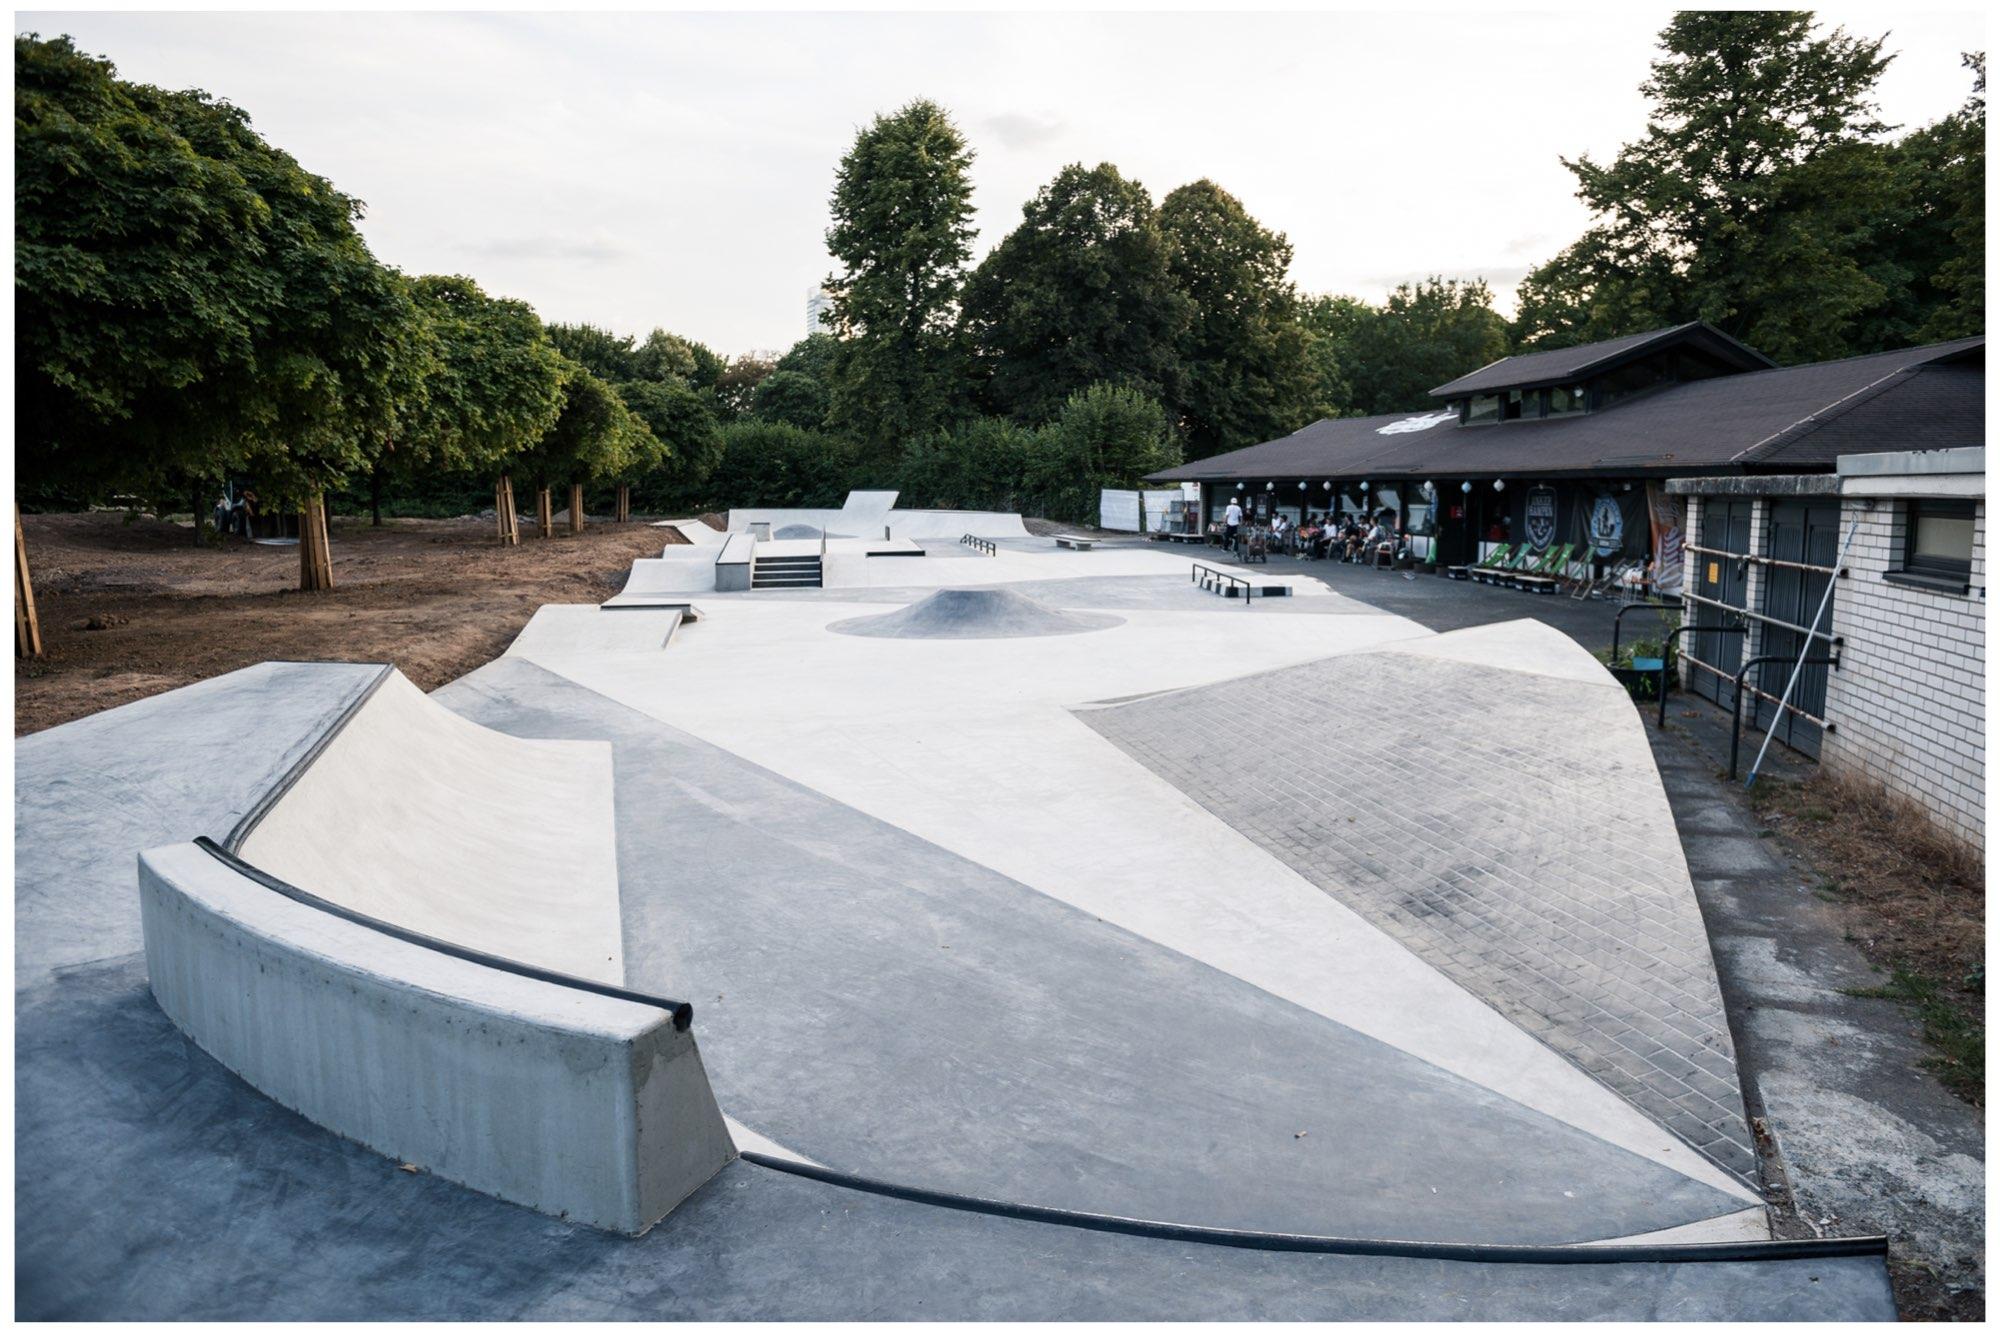 lndskt_skatepark_planung_bonn_01